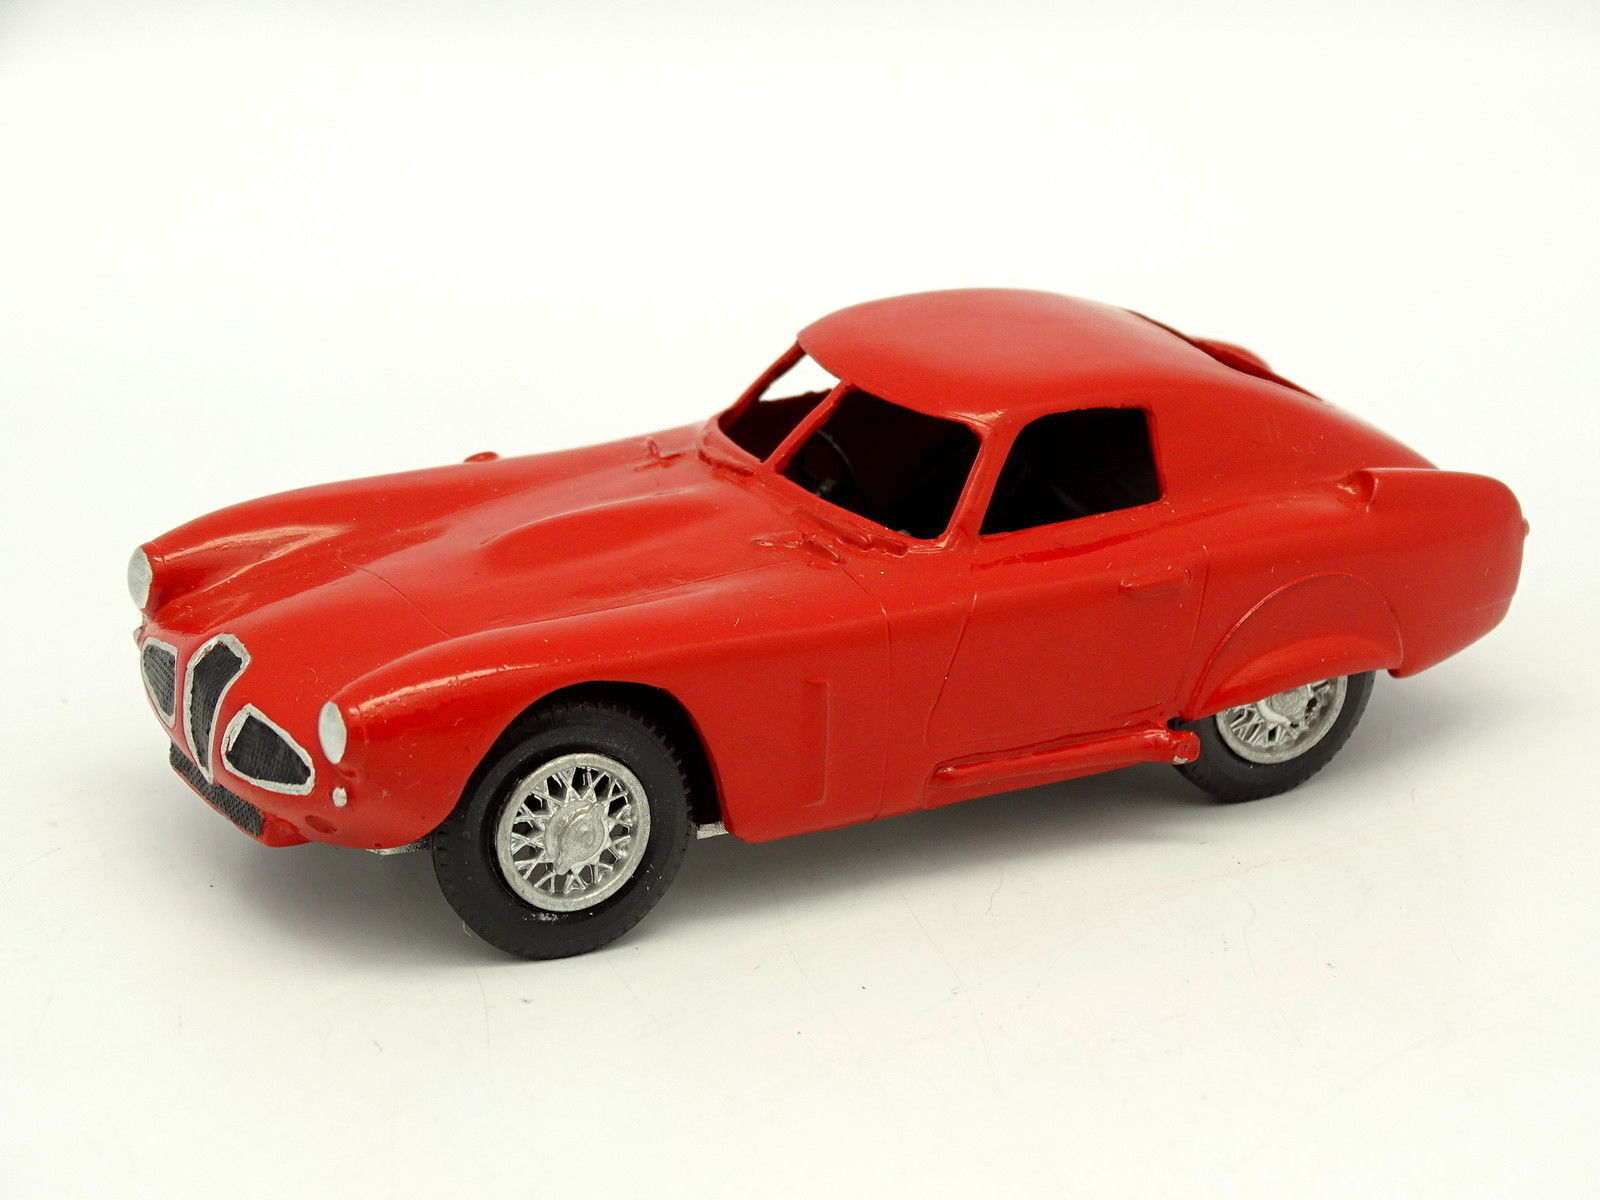 John Day Kit Monté Métal 1 43 - Alfa Romeo Mille Miglia 1953